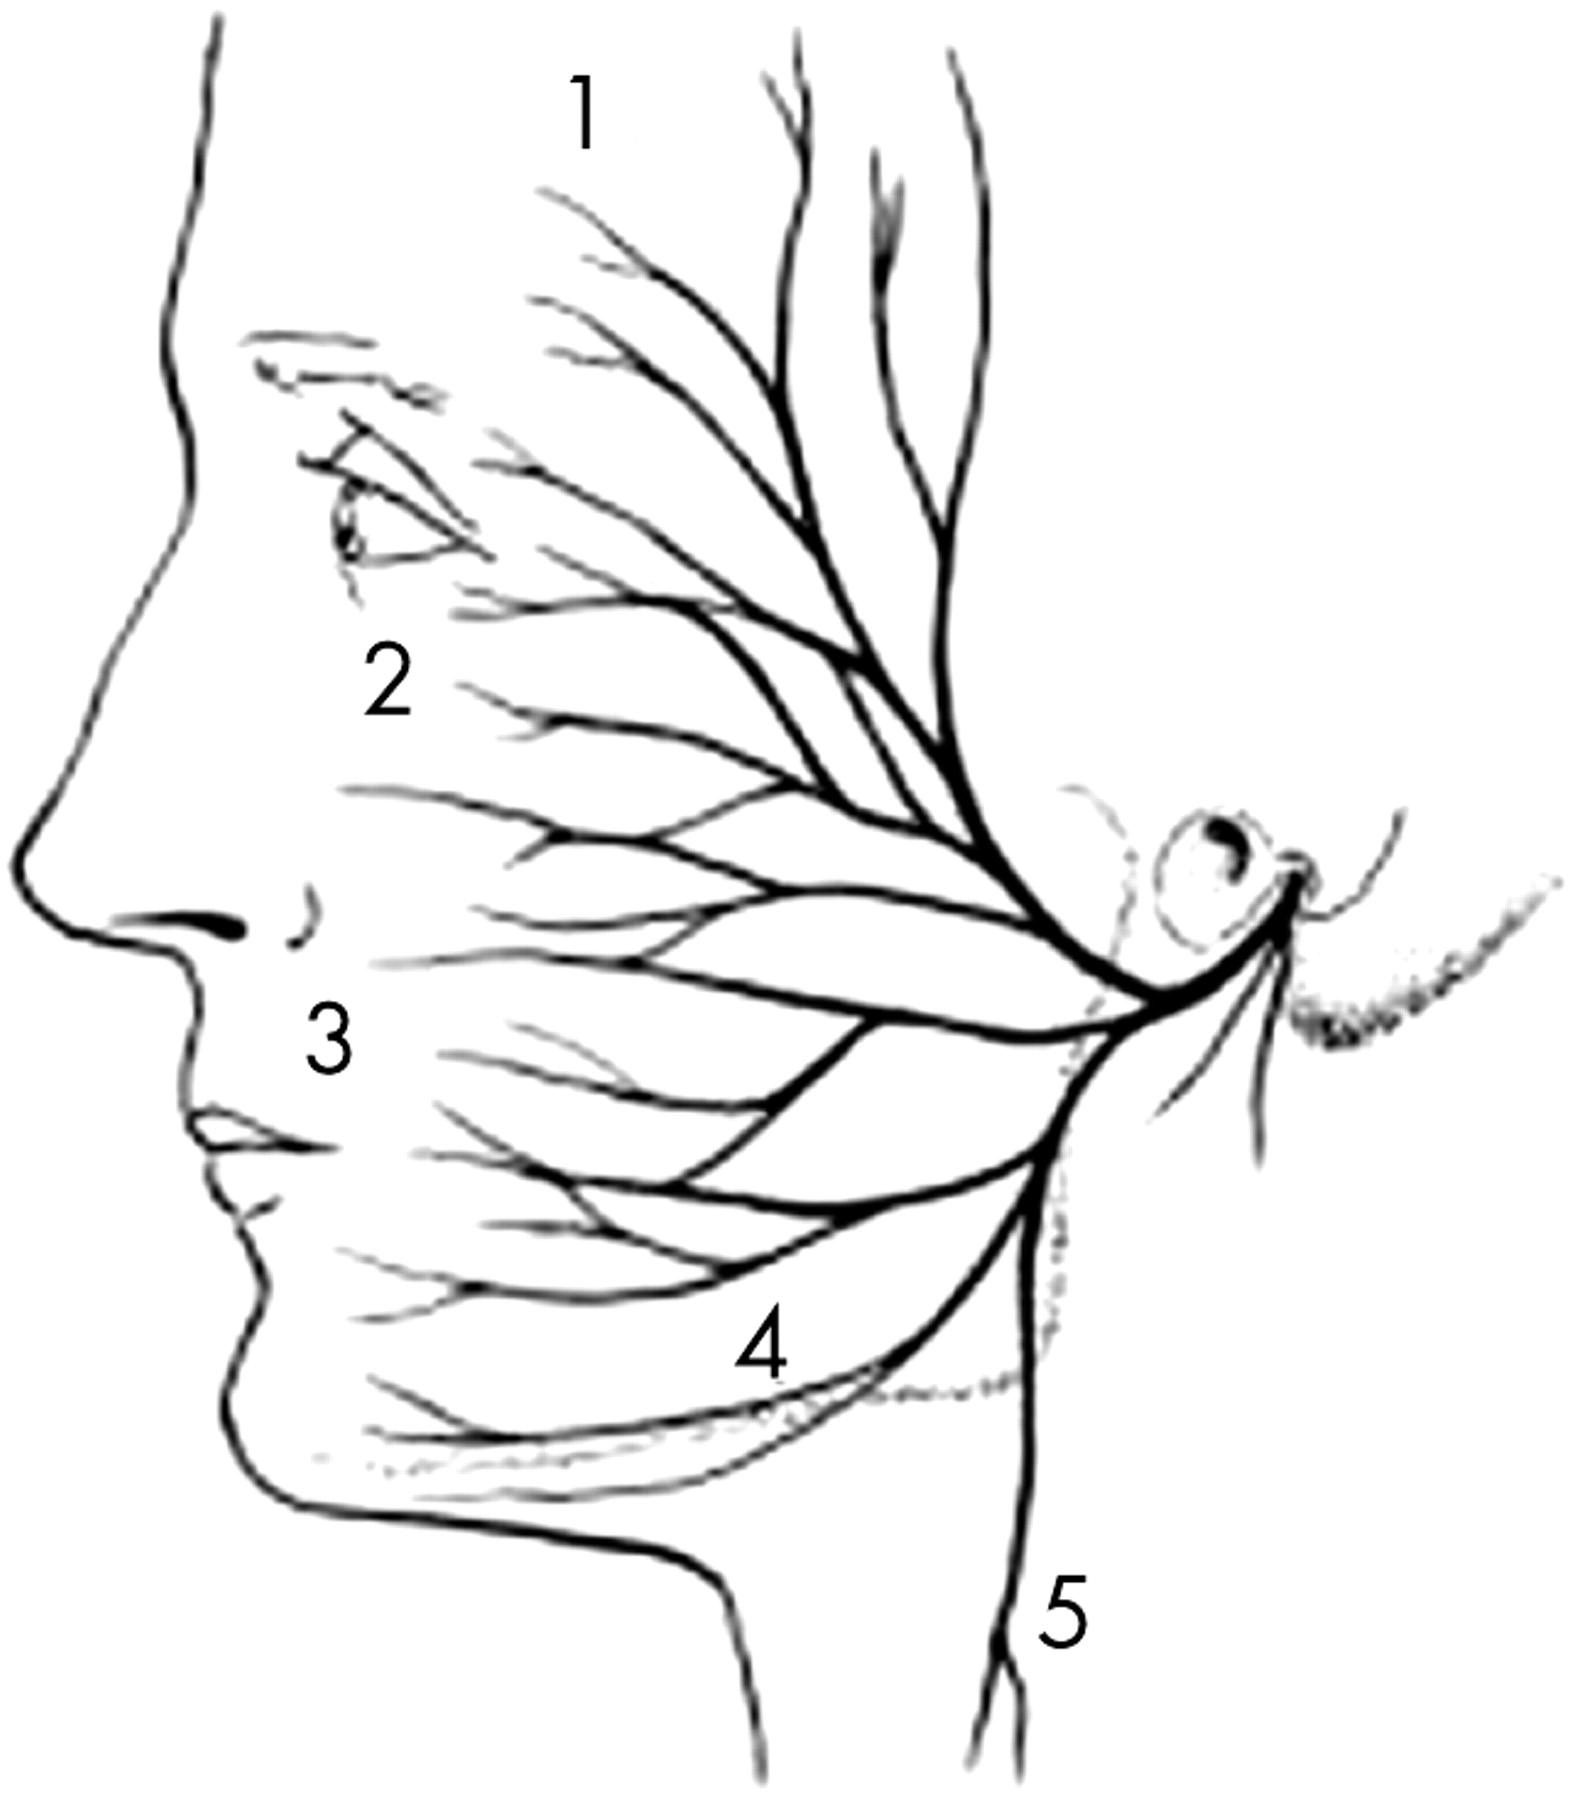 Clinical Test Discloses Marginalis Mandibulae Branch